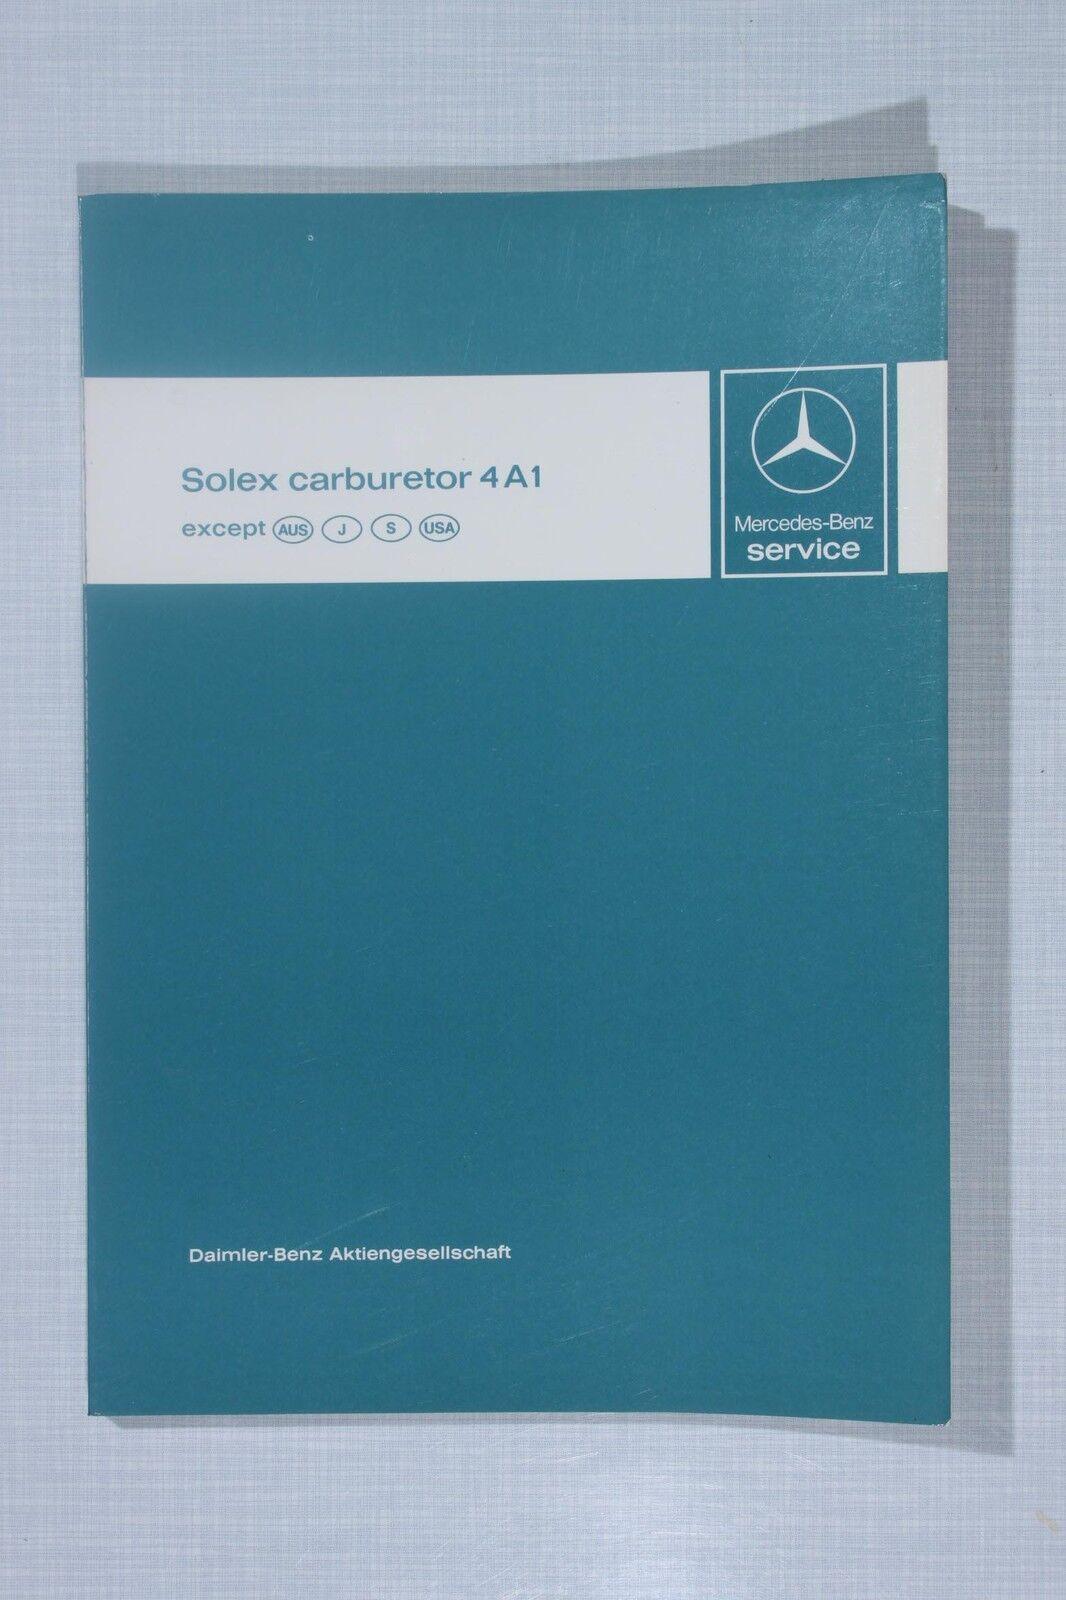 Mercedes-Benz Solex Introduction into Service Manual 4A1 Carburetor on triumph tr6 wiring diagram, triumph spitfire forum, triumph spitfire brochure, triumph spitfire parts, triumph spitfire engine swap, triumph tr7 wiring diagram, triumph tr4 wiring diagram, triumph spitfire 1500, triumph stag wiring diagram,